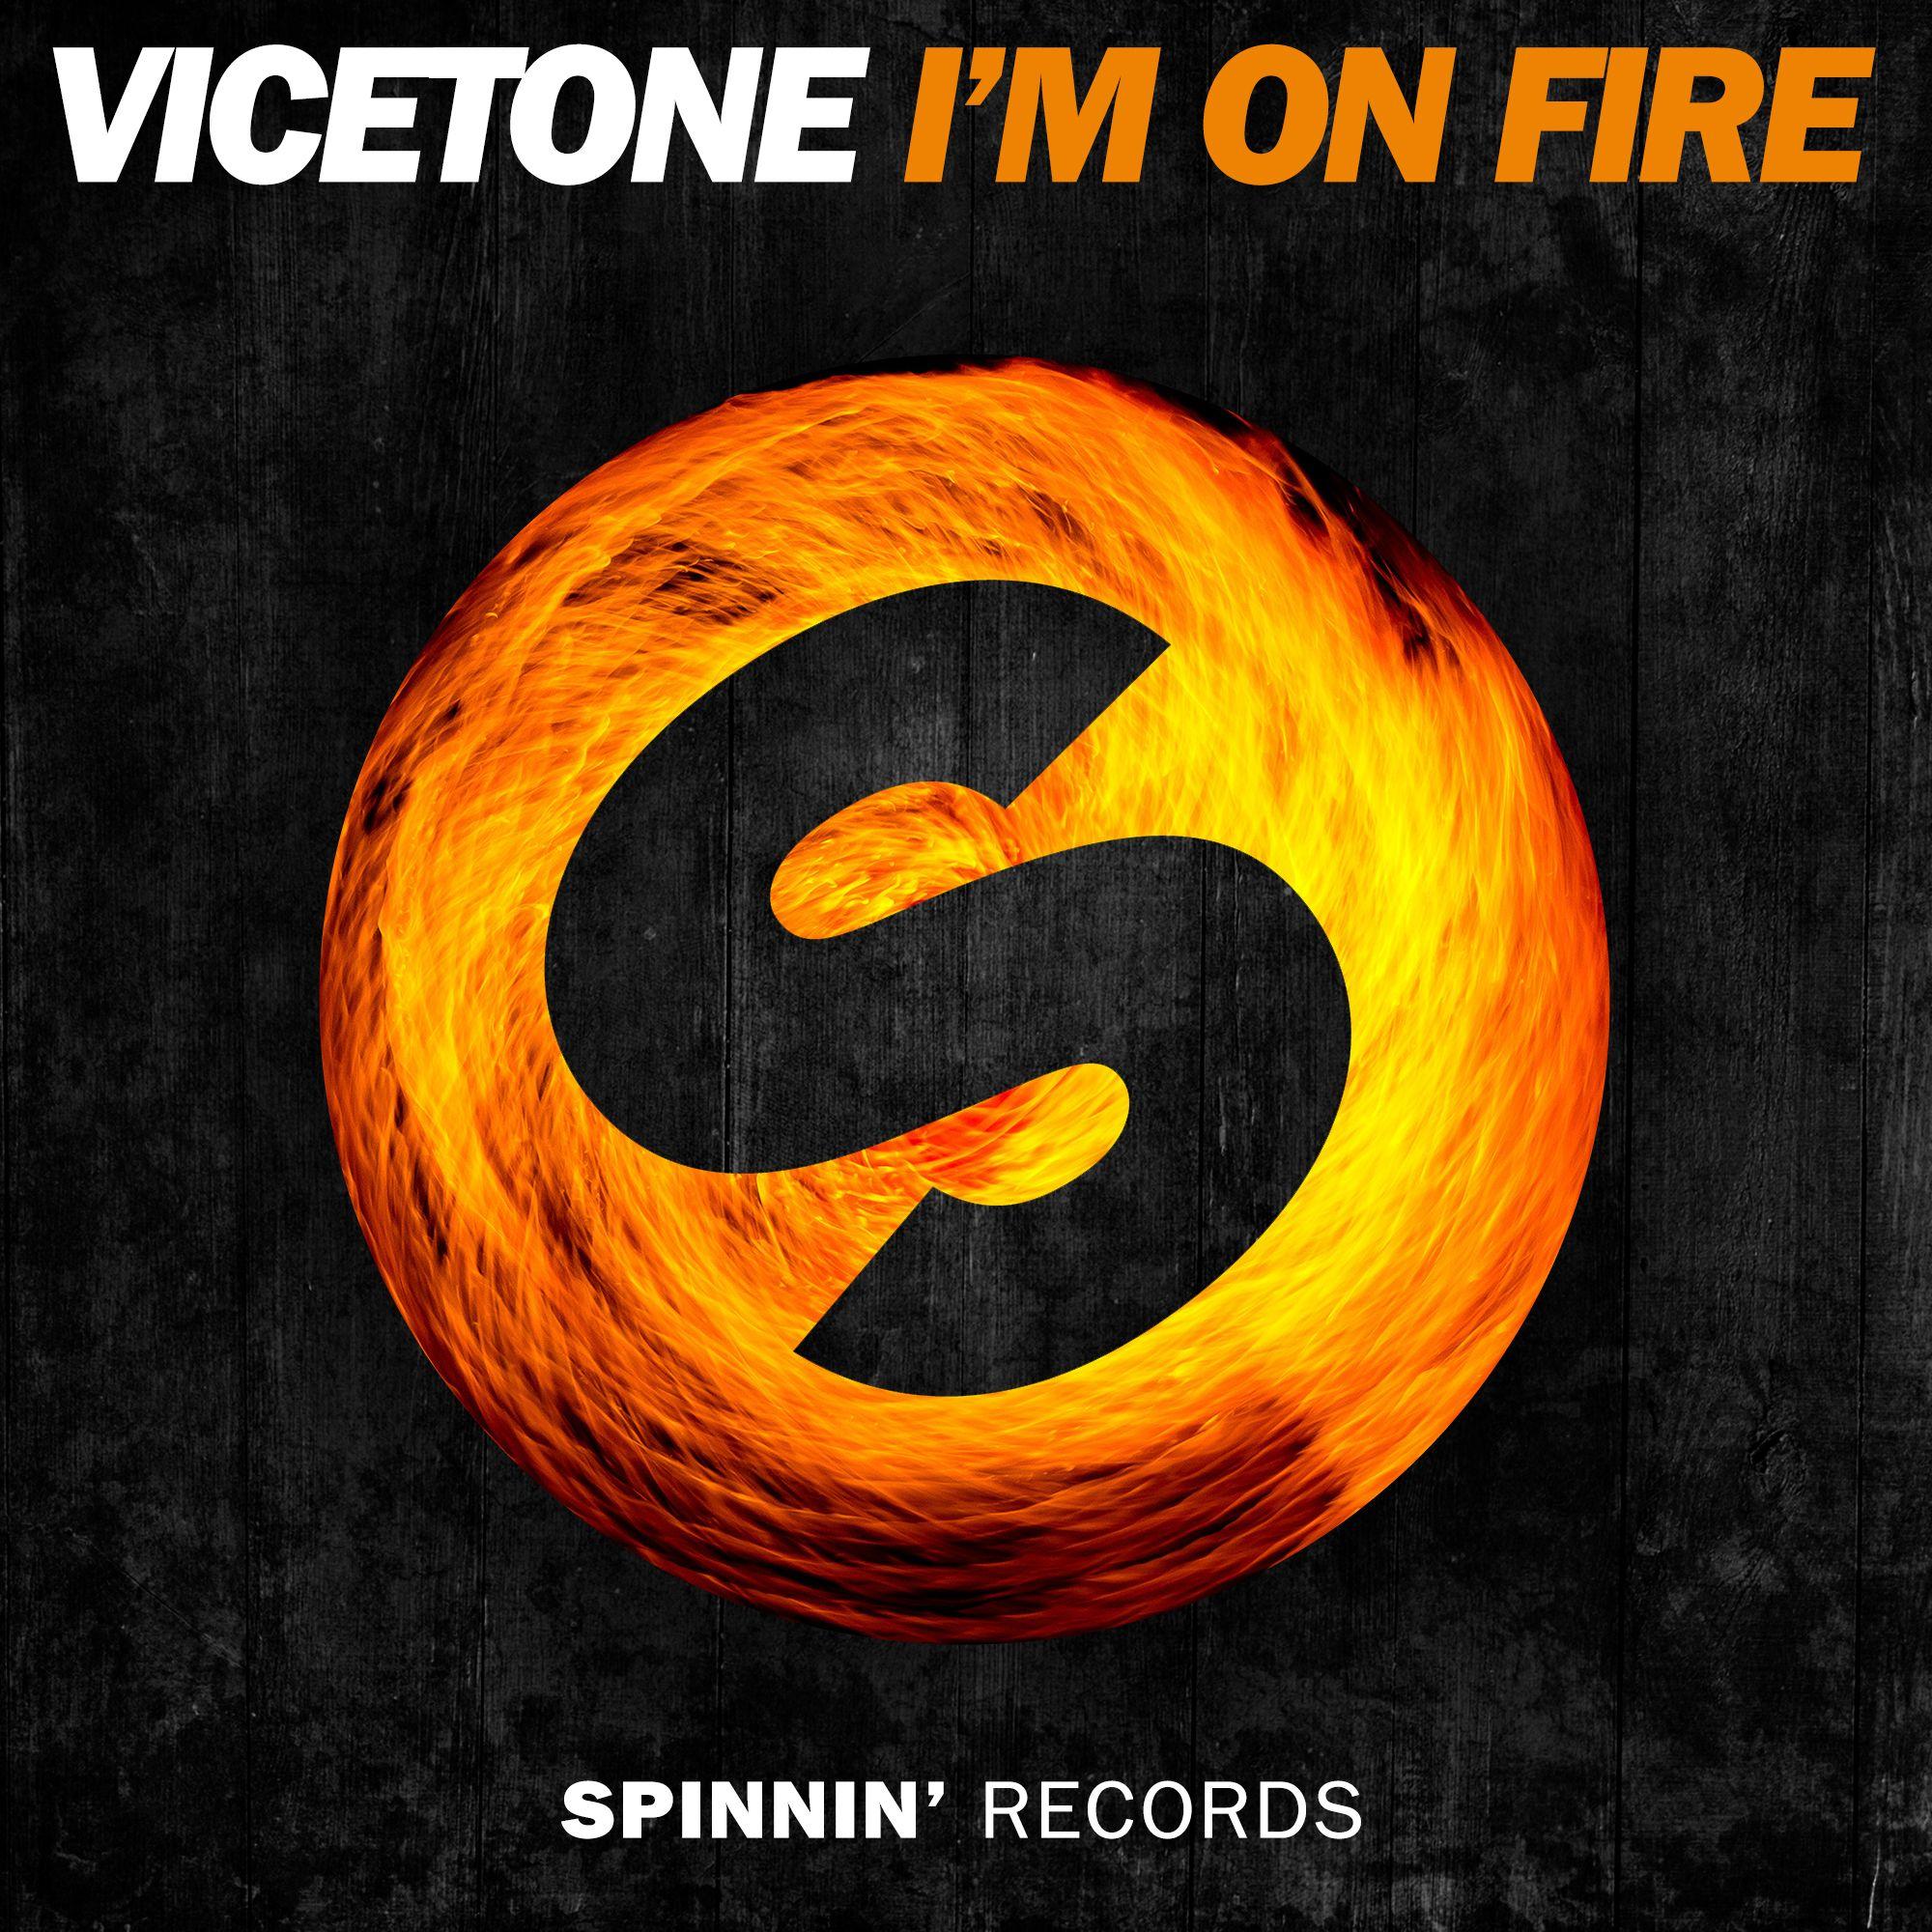 spinnin_vicetone_-_im_on_fire.jpeg